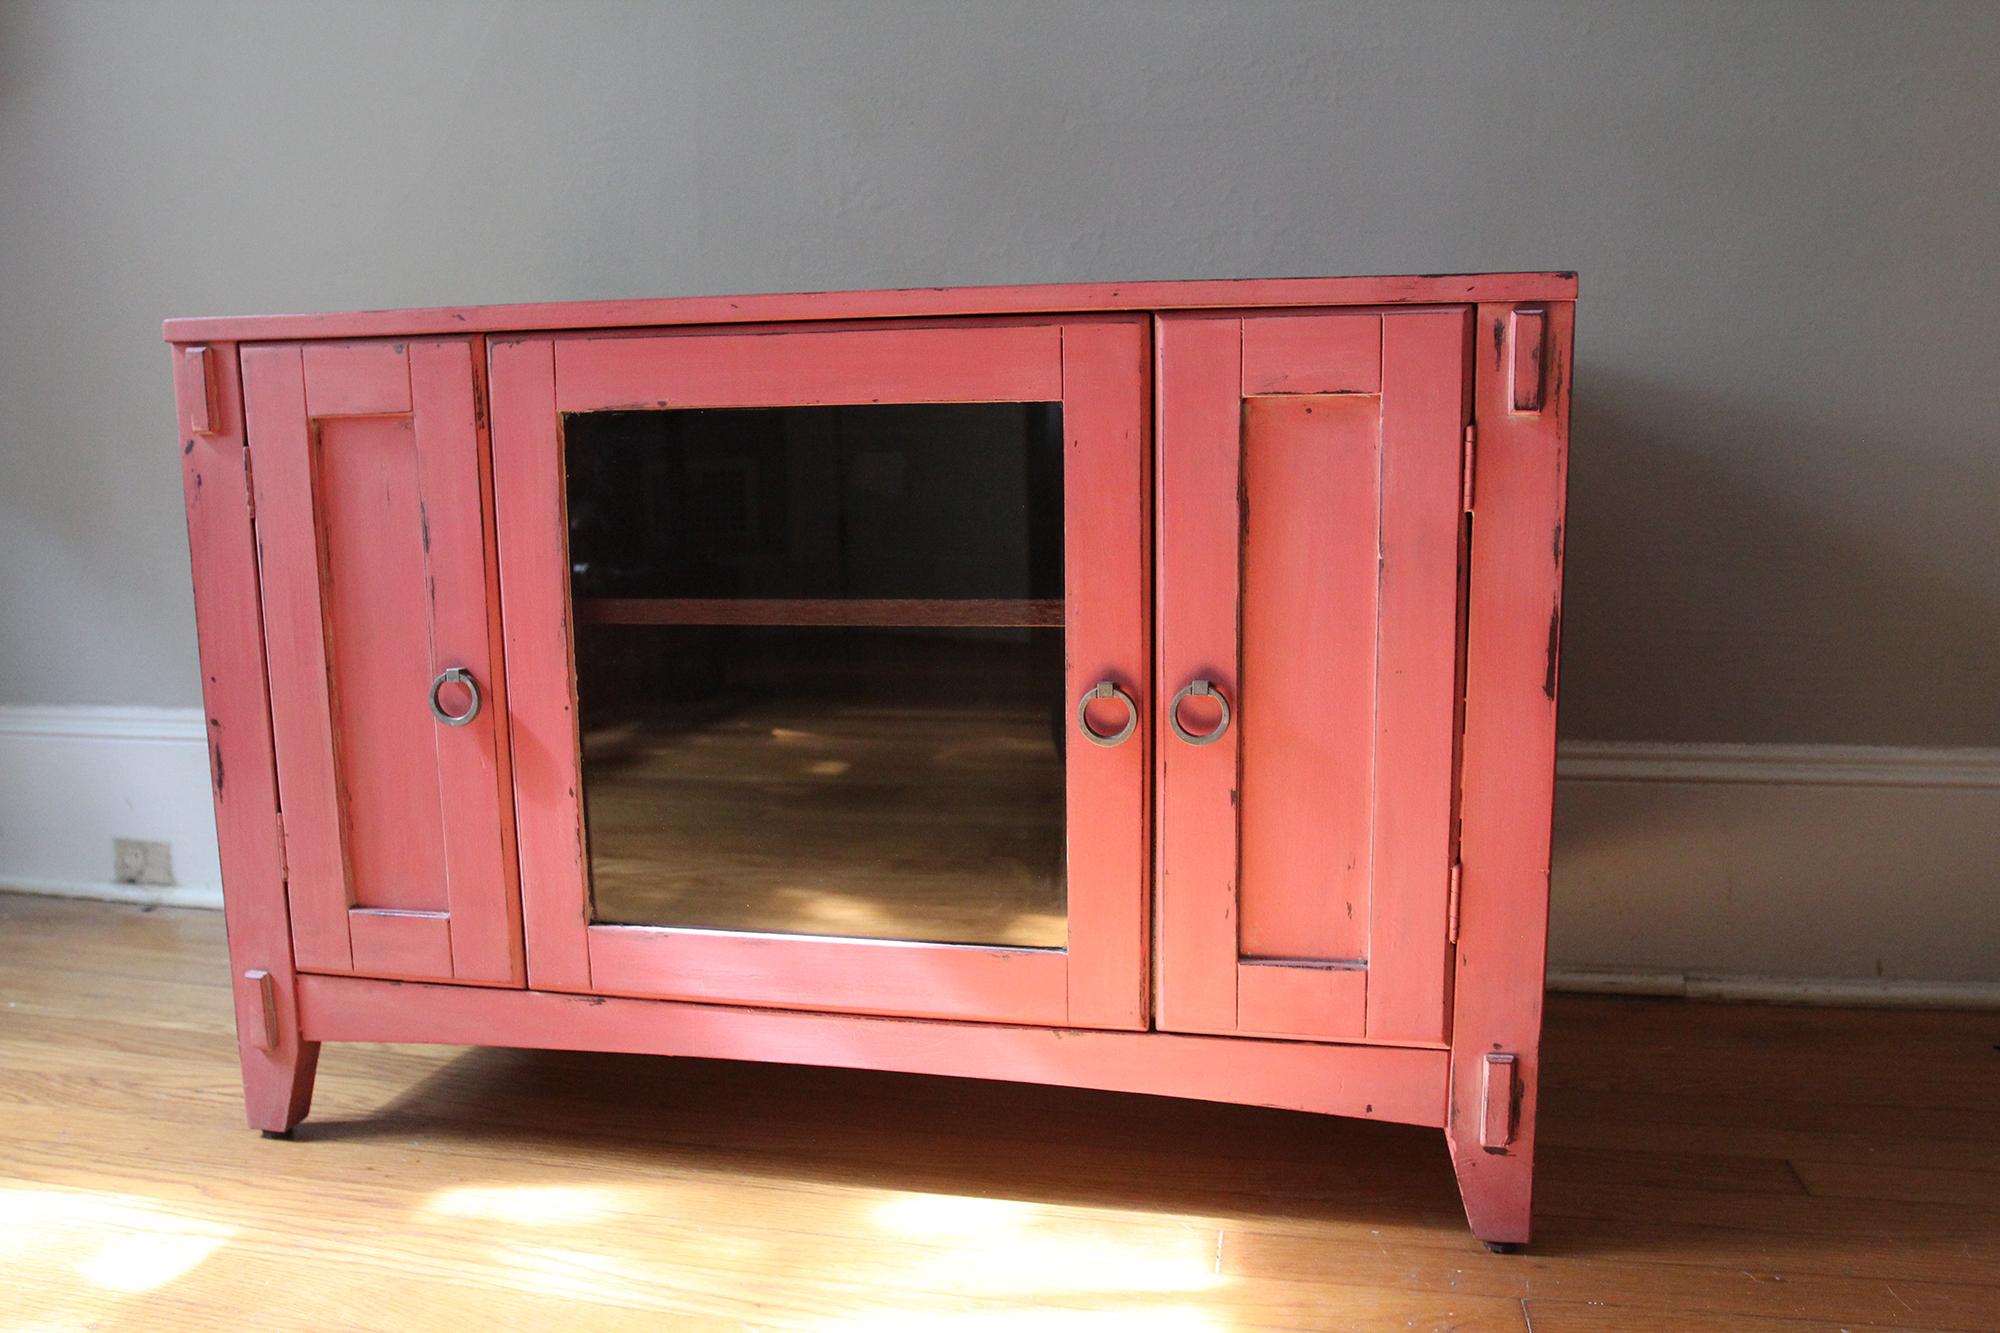 jo-torrijos-a-simpler-design-annie-sloan-chalk-paint-burgundy-arles-english-yellow-coral-atlanta-painted-furniture-2.jpg